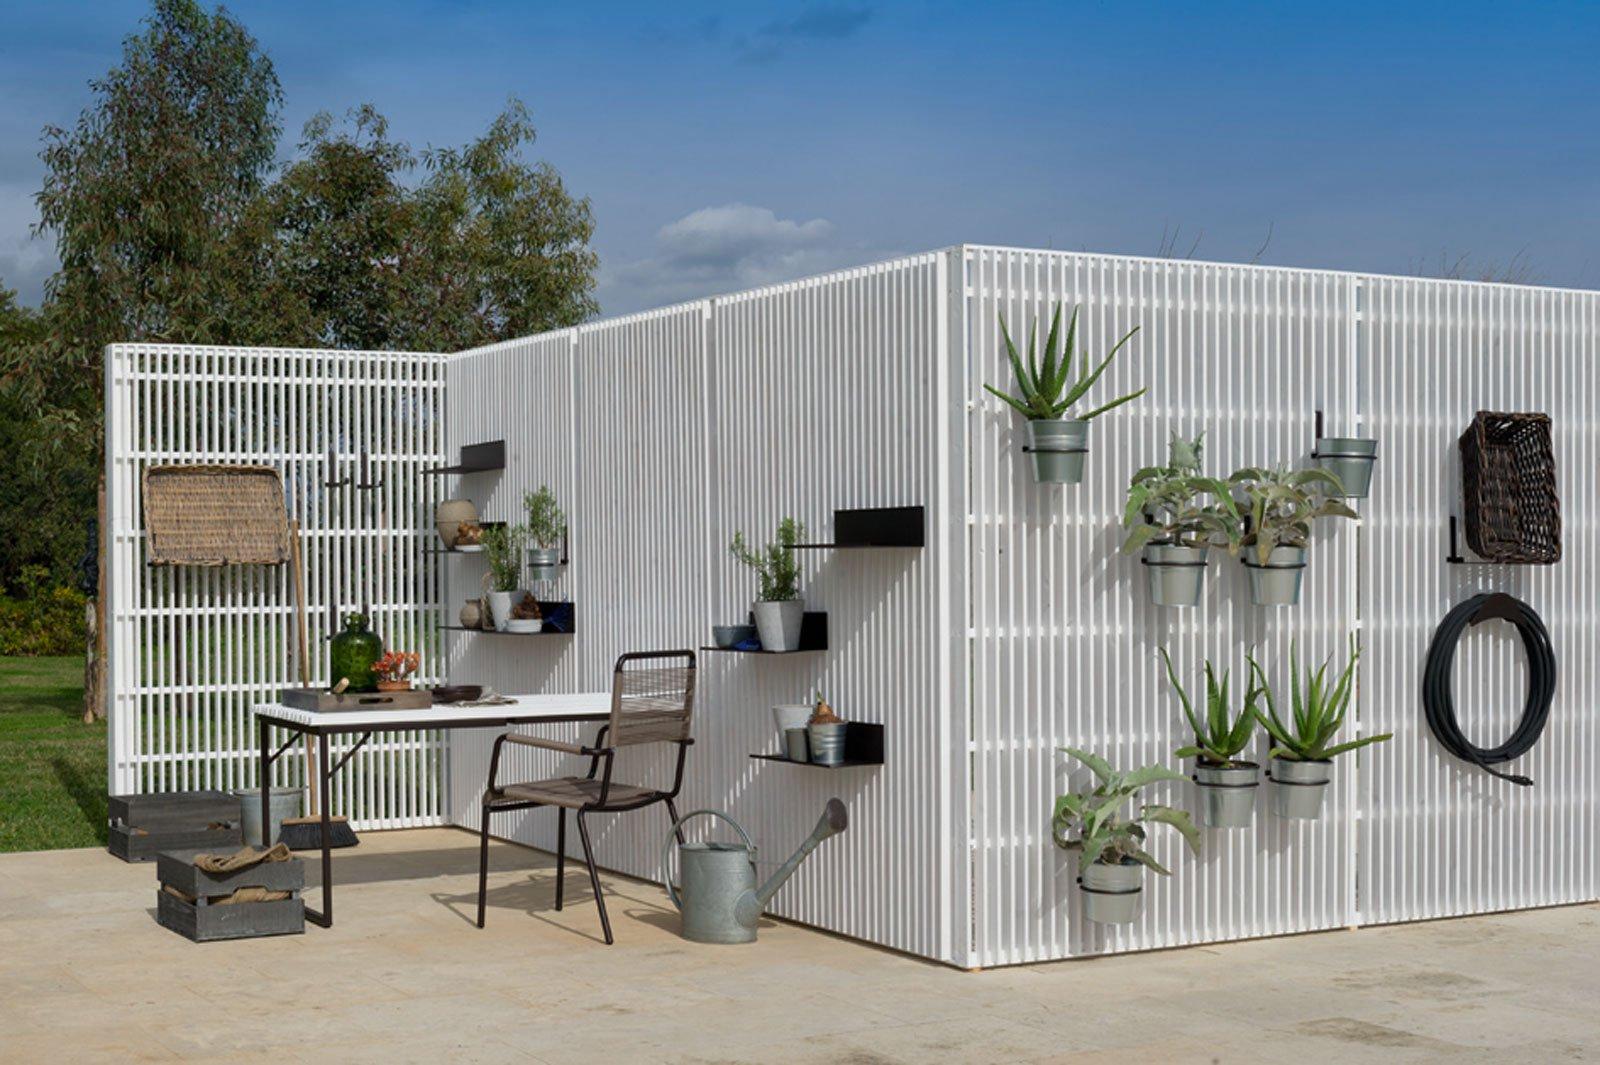 ai saloni 2015 le proposte d 39 arredo per esterni cose di casa. Black Bedroom Furniture Sets. Home Design Ideas